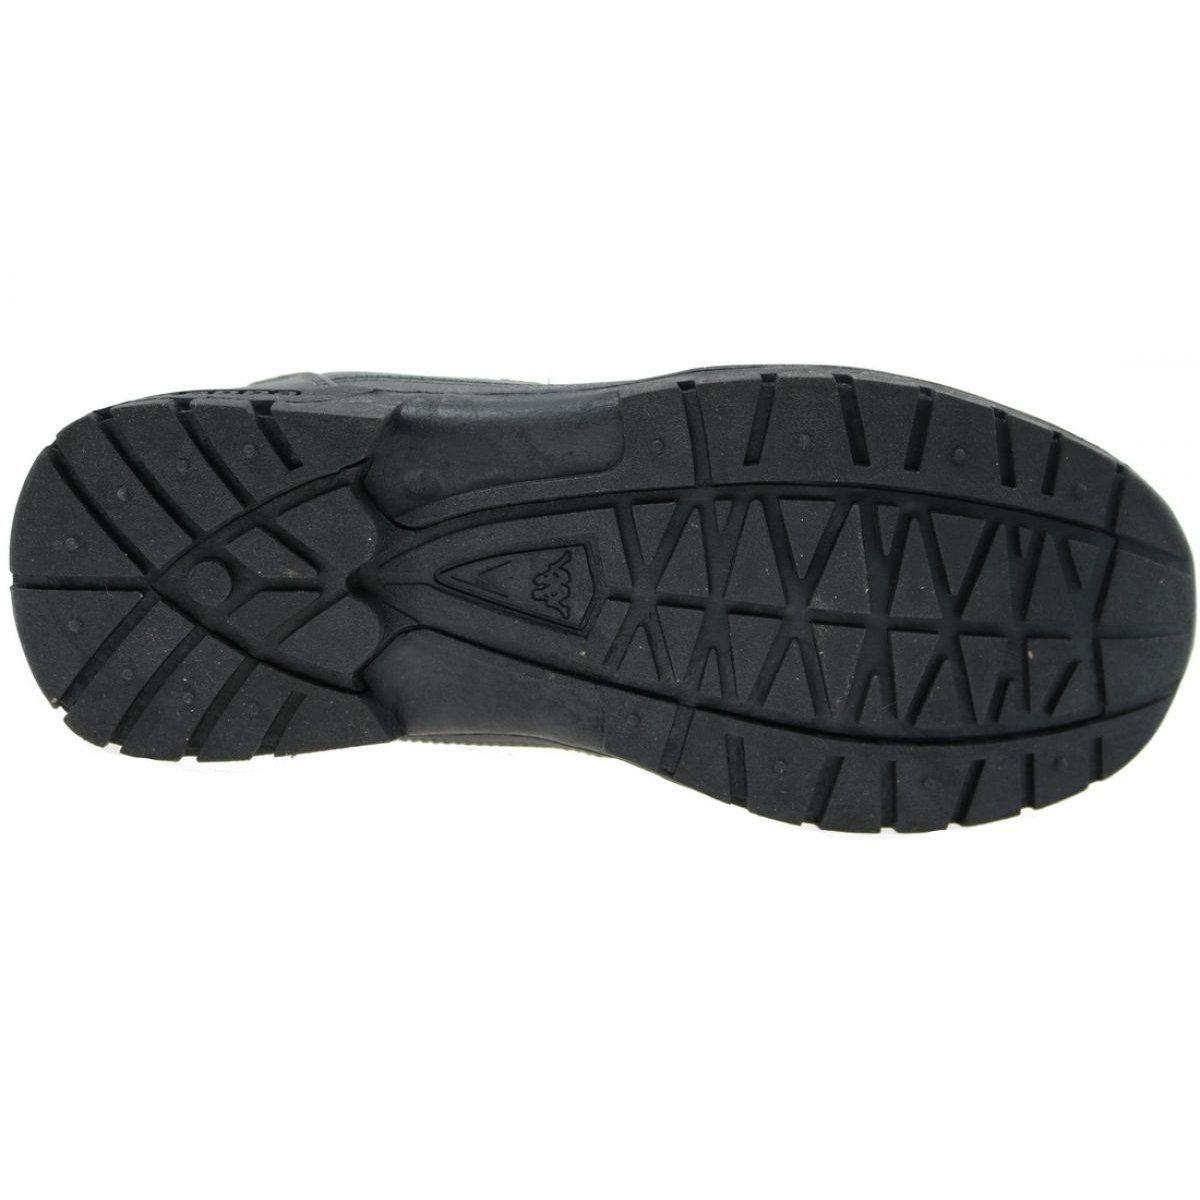 Buty Kappa Bright Mid Light M 242075 1616 Szare Sport Shoes Men Shoes Footwear